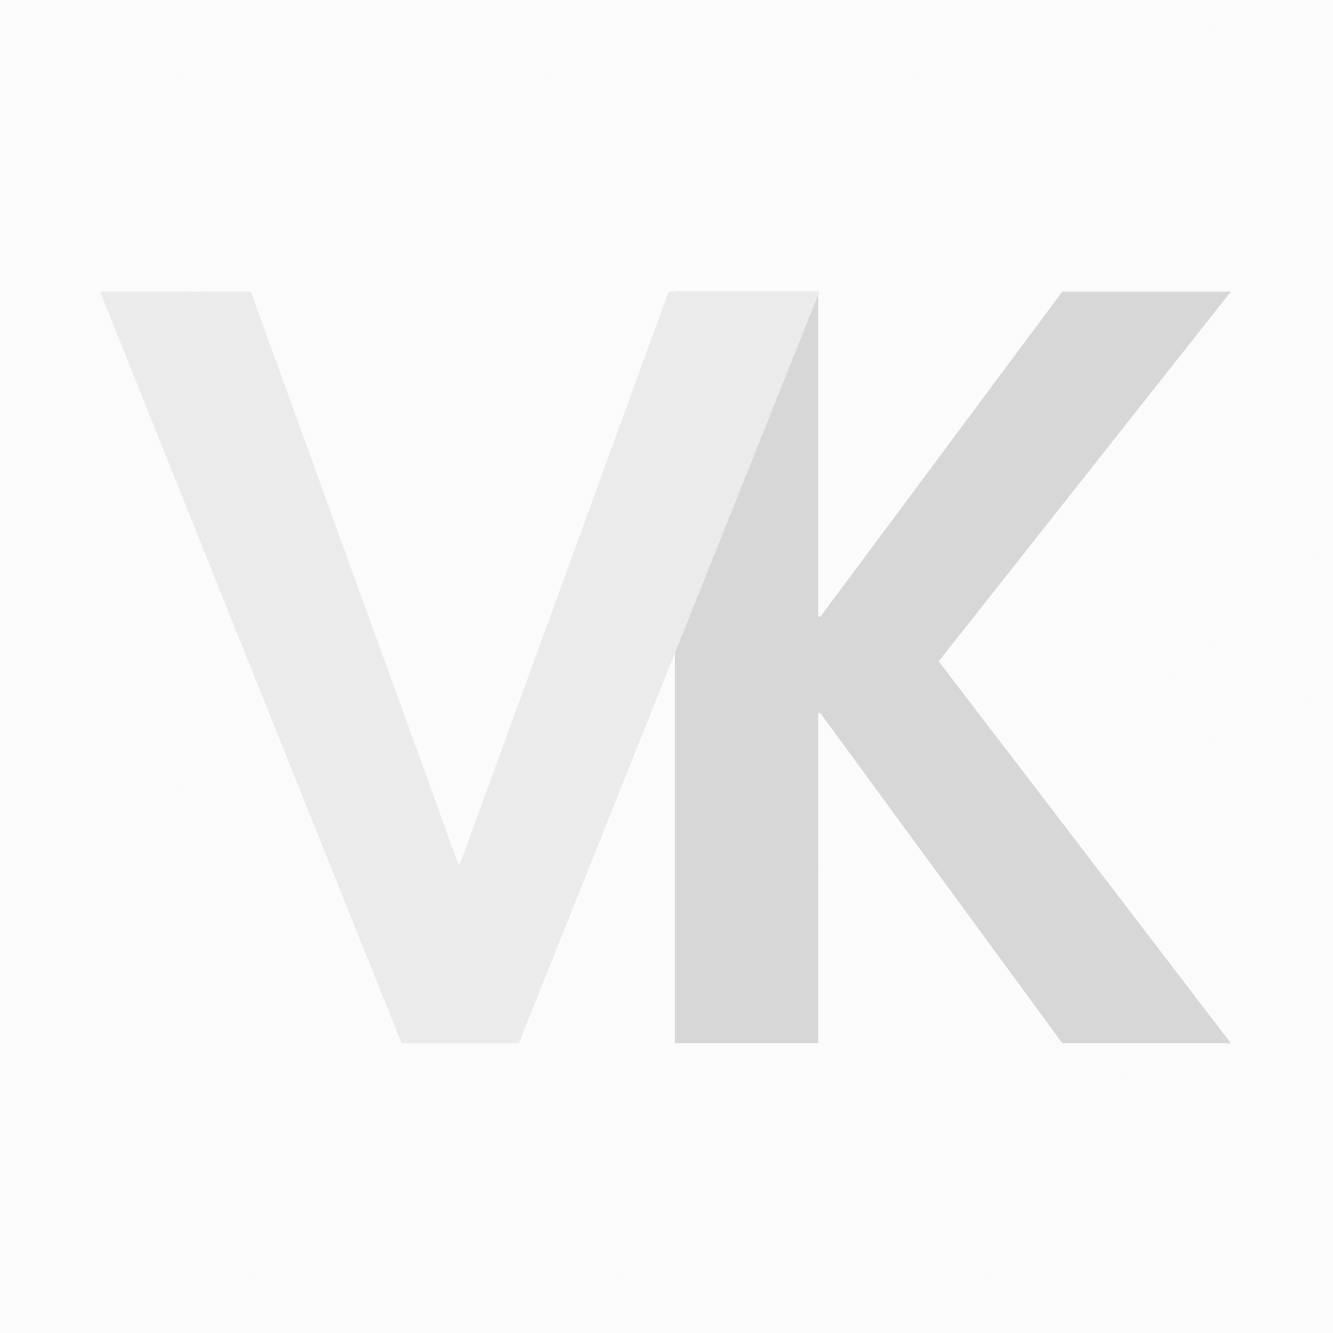 BabylissPRO Kegelvormige Krultang Titanium-Tourmaline 13/25mm